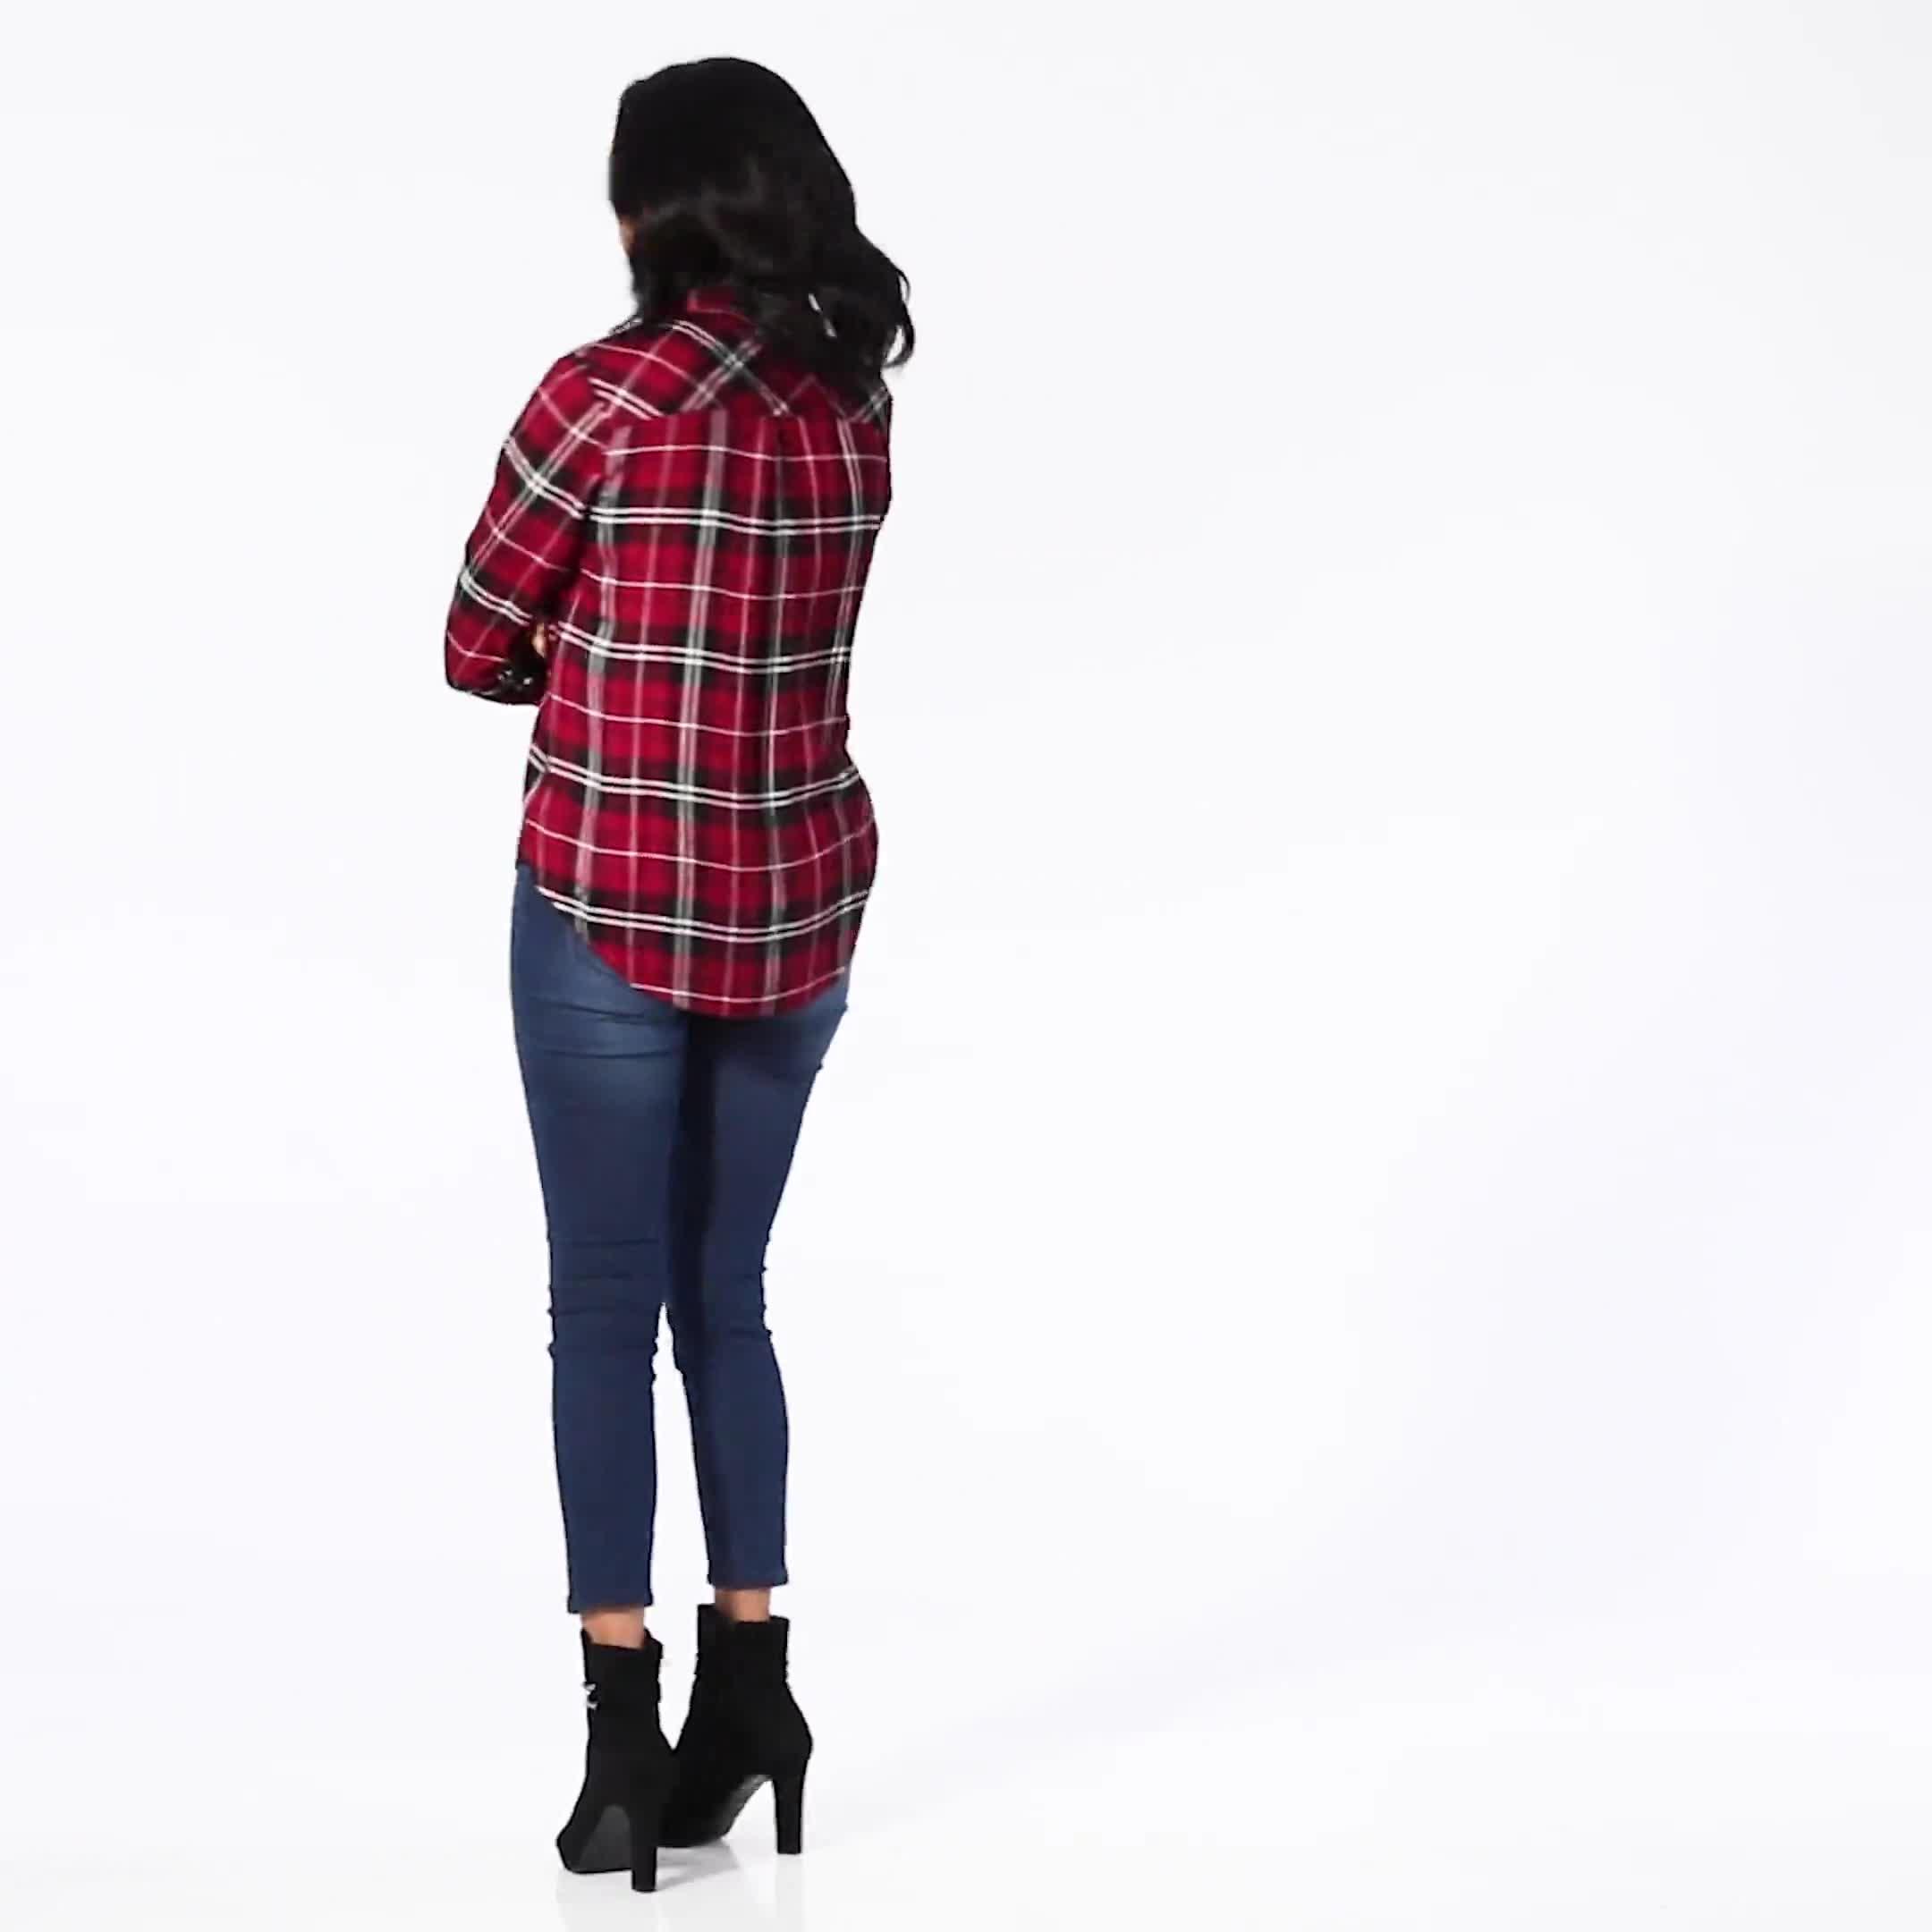 Red Rayon Plaid Long Sleeve Roll Tab Shirt - Video